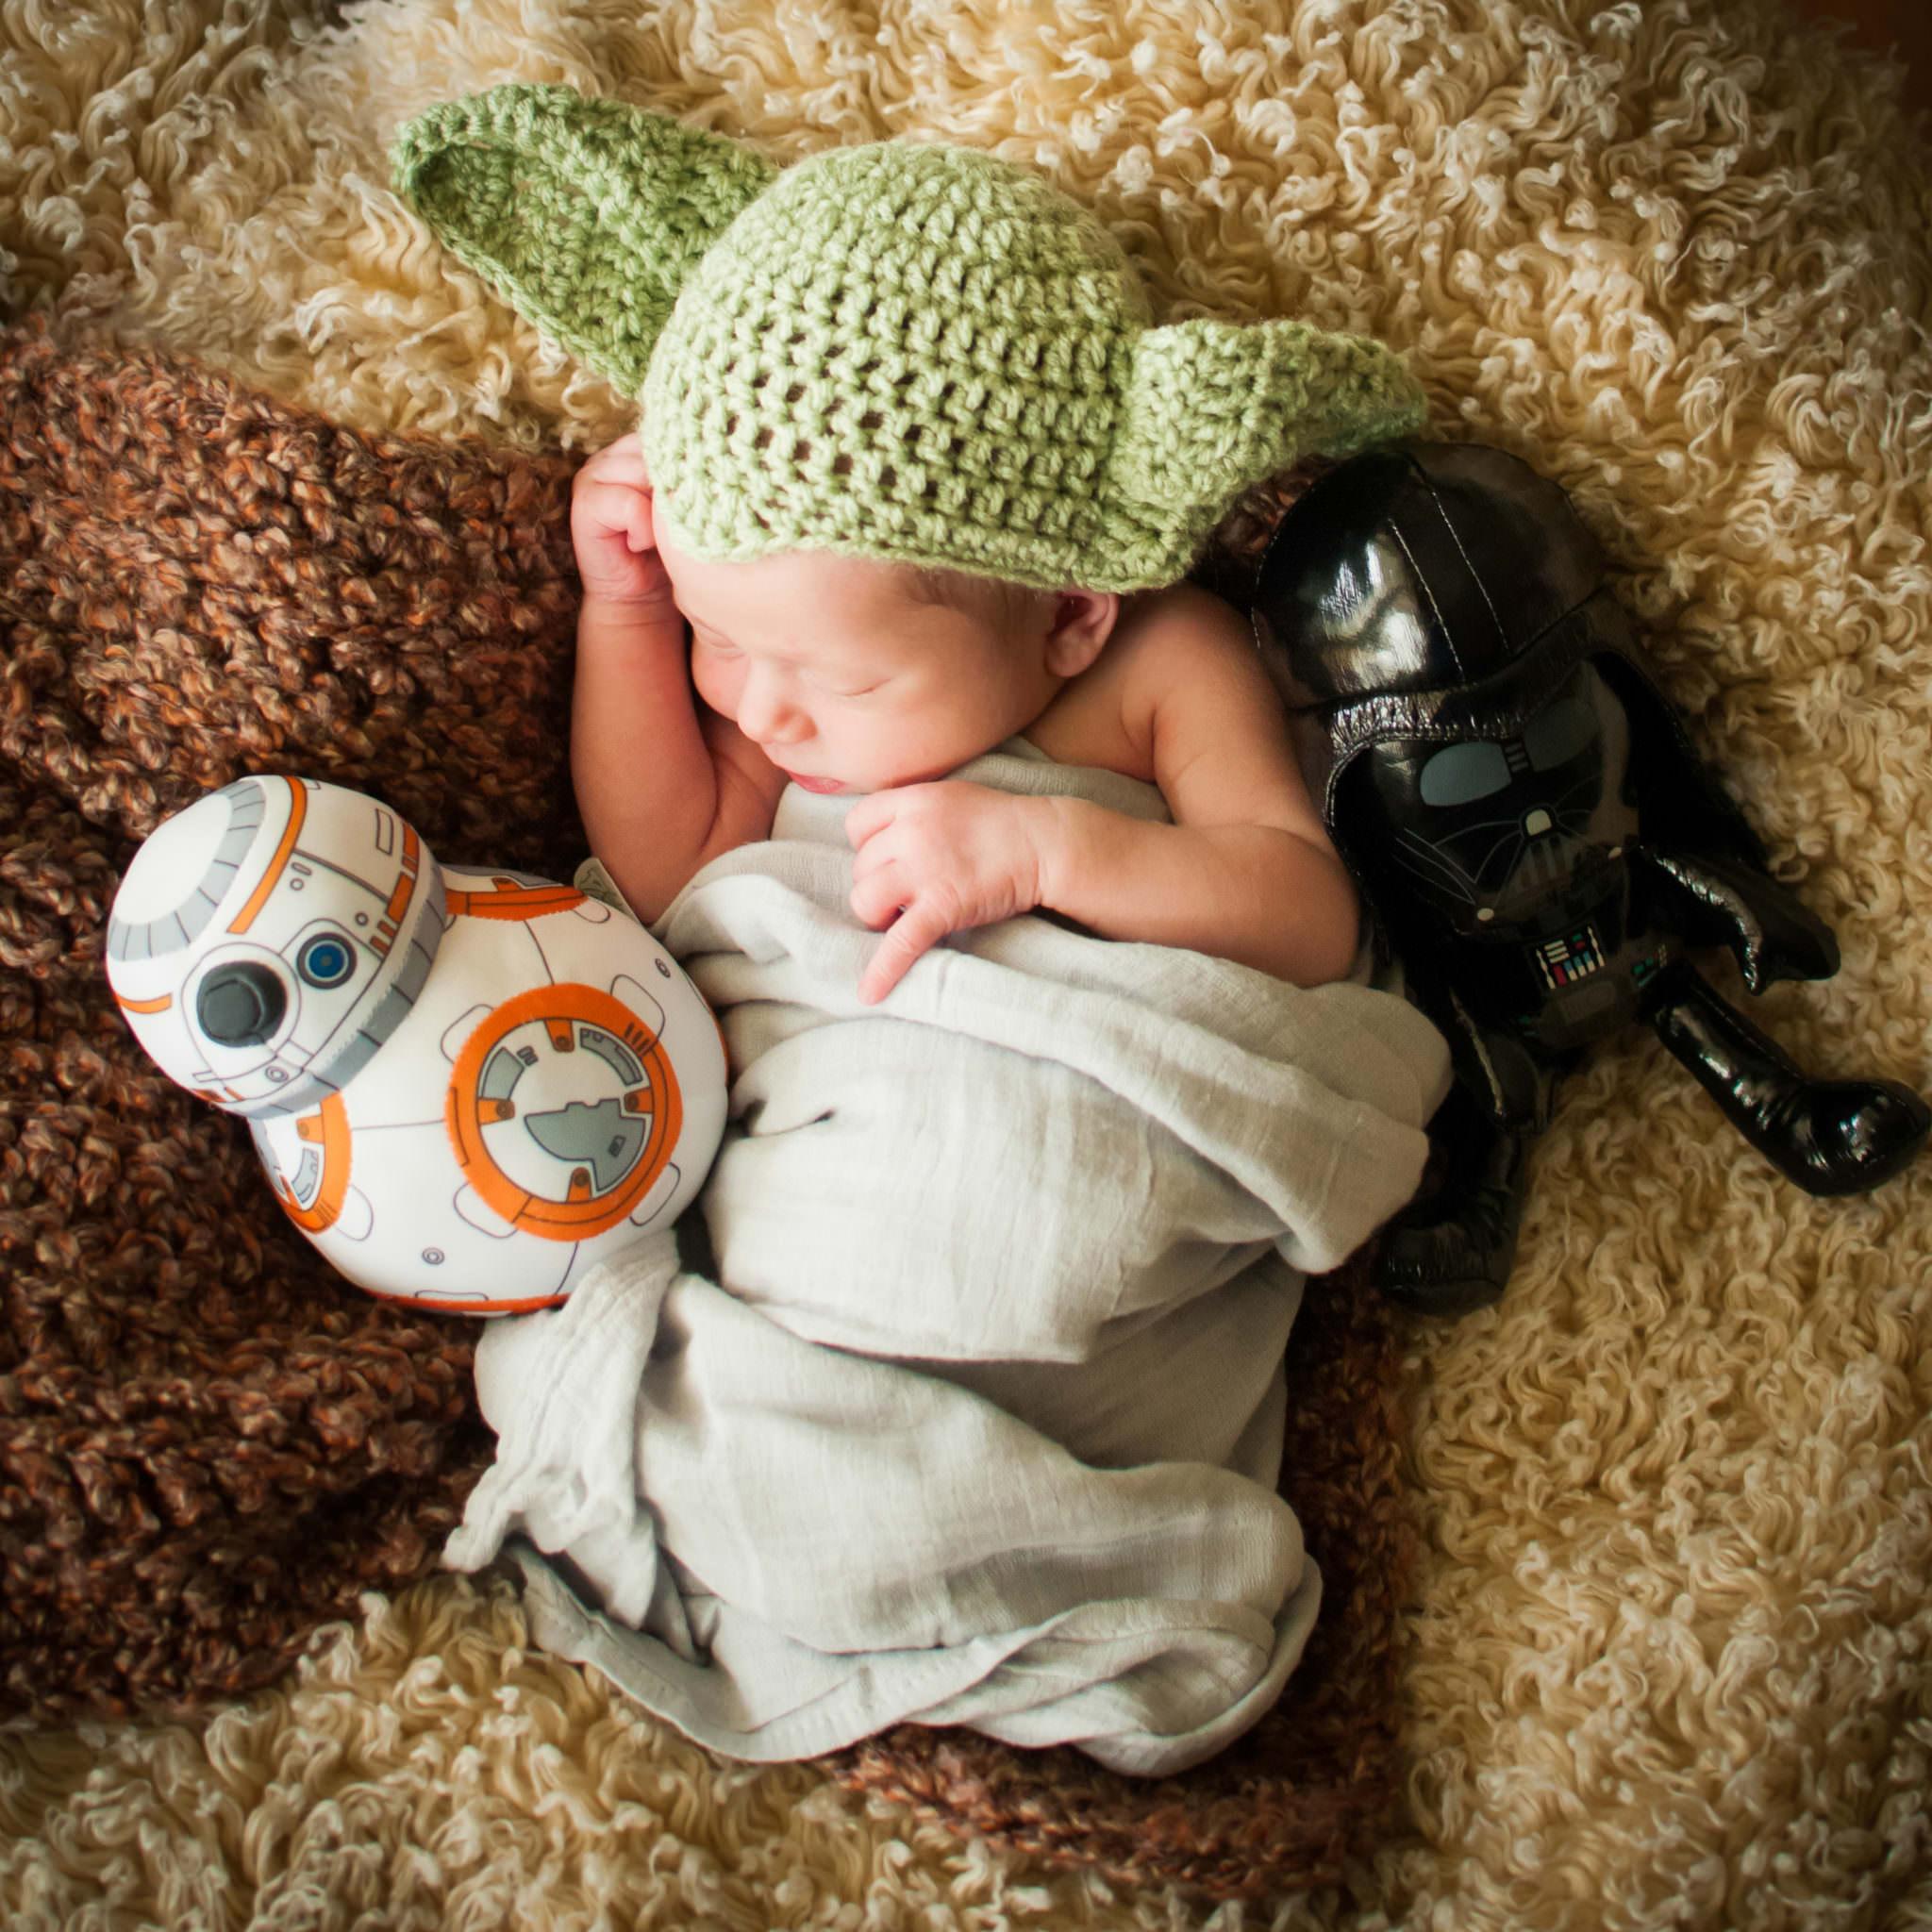 Newborn baby in yoda hat, Styled Baby Photographer in Livonia